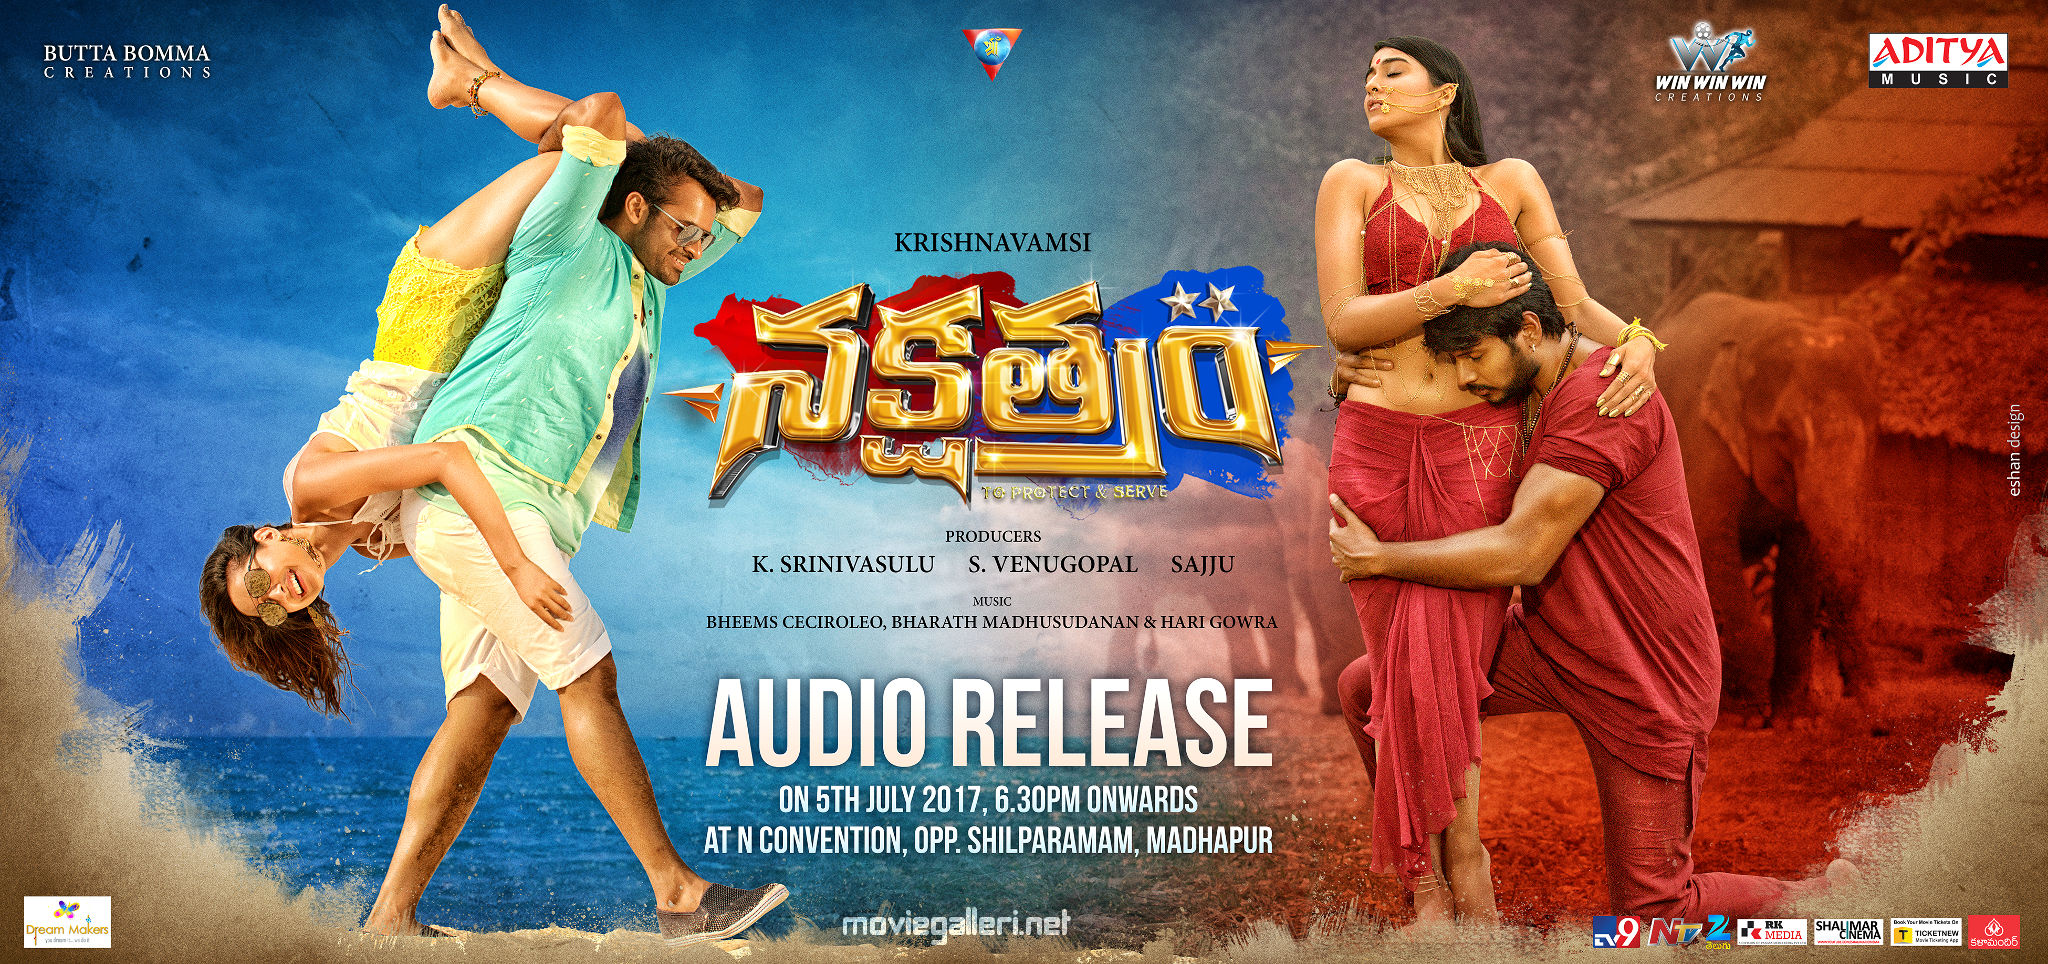 Nakshatram Movie Audio Release July 5th Wallpaper